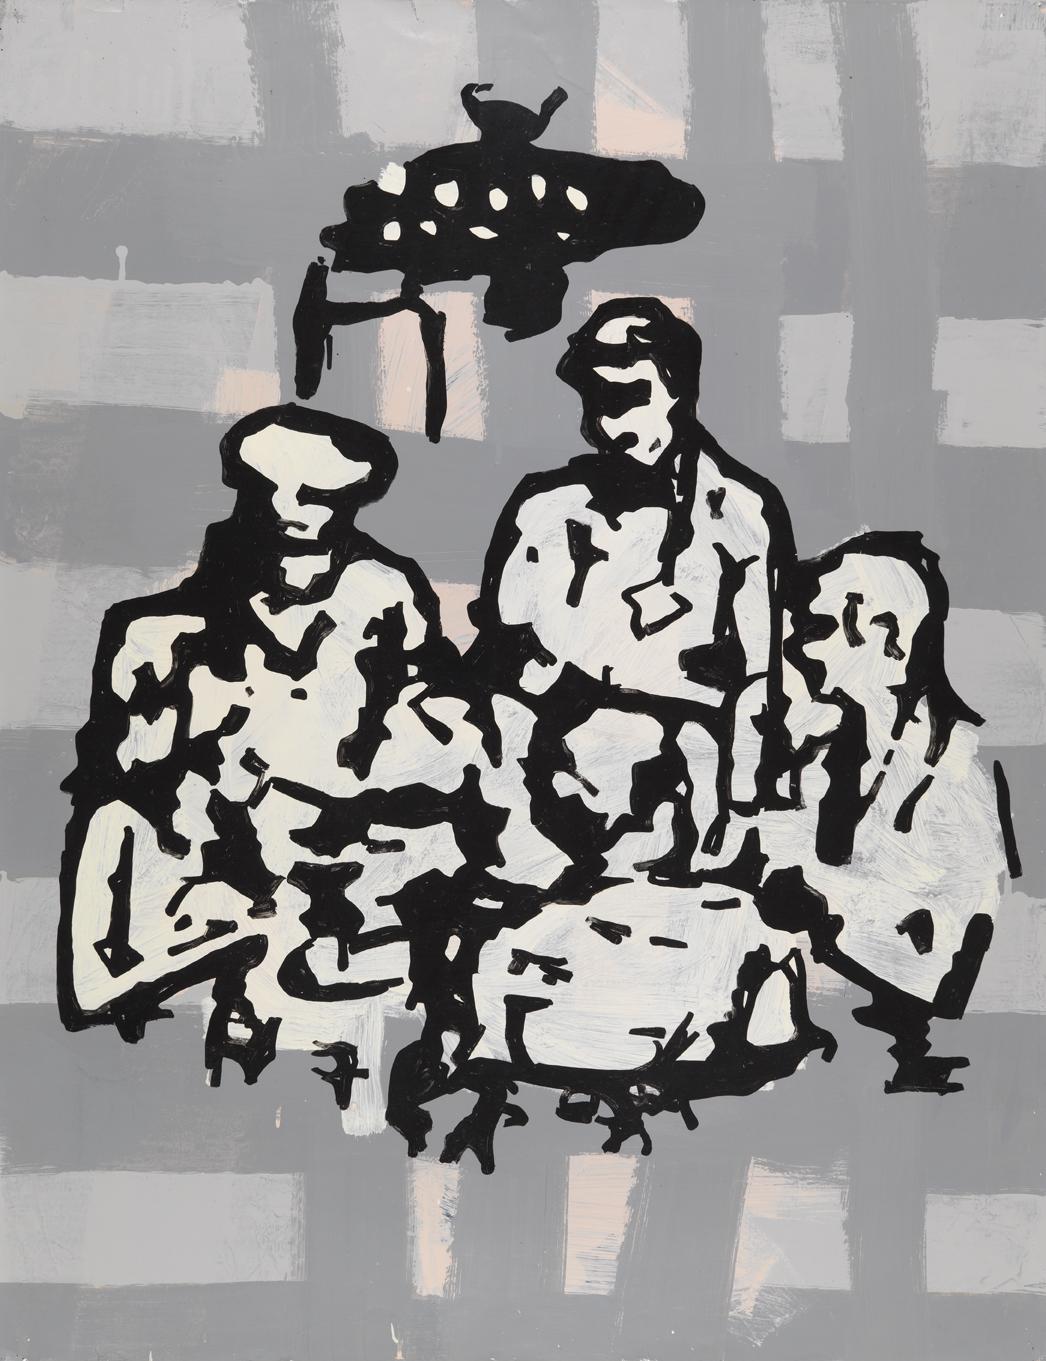 Resort Group (Food) Second Version   1982  oil based enamel on paper  46 x 35 in / 116.8 x 88.9 cm